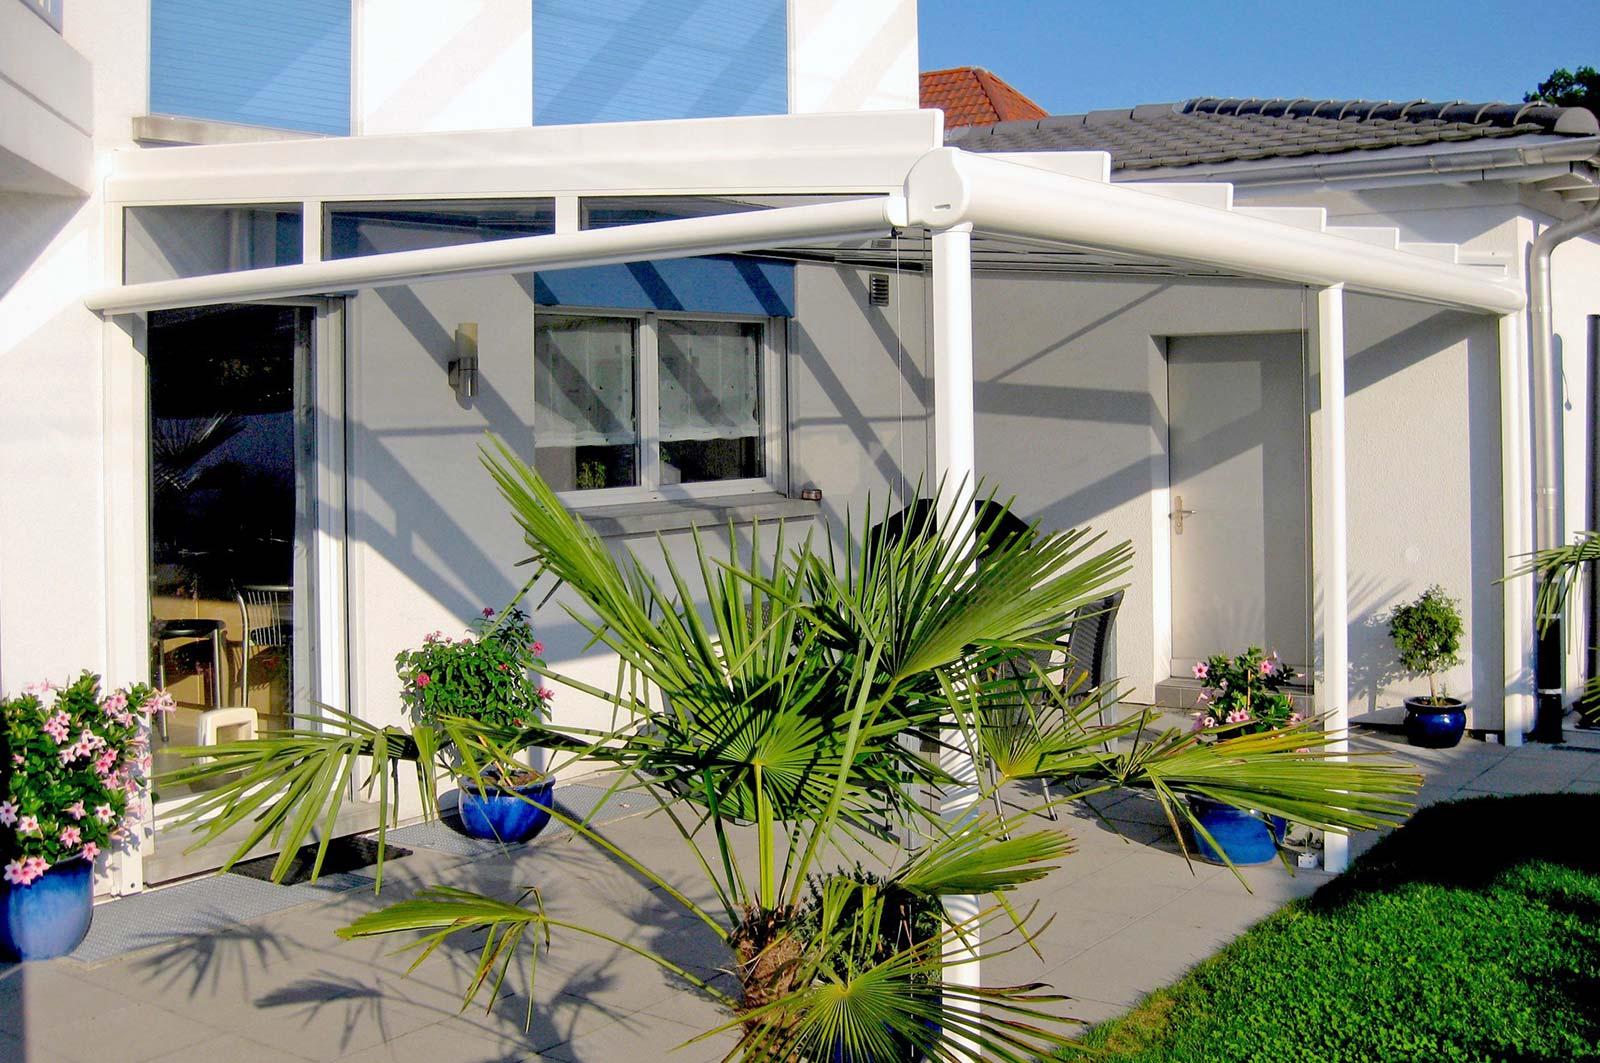 WIGASOL - Ma véranda : WIGASOL couverture de terrasse